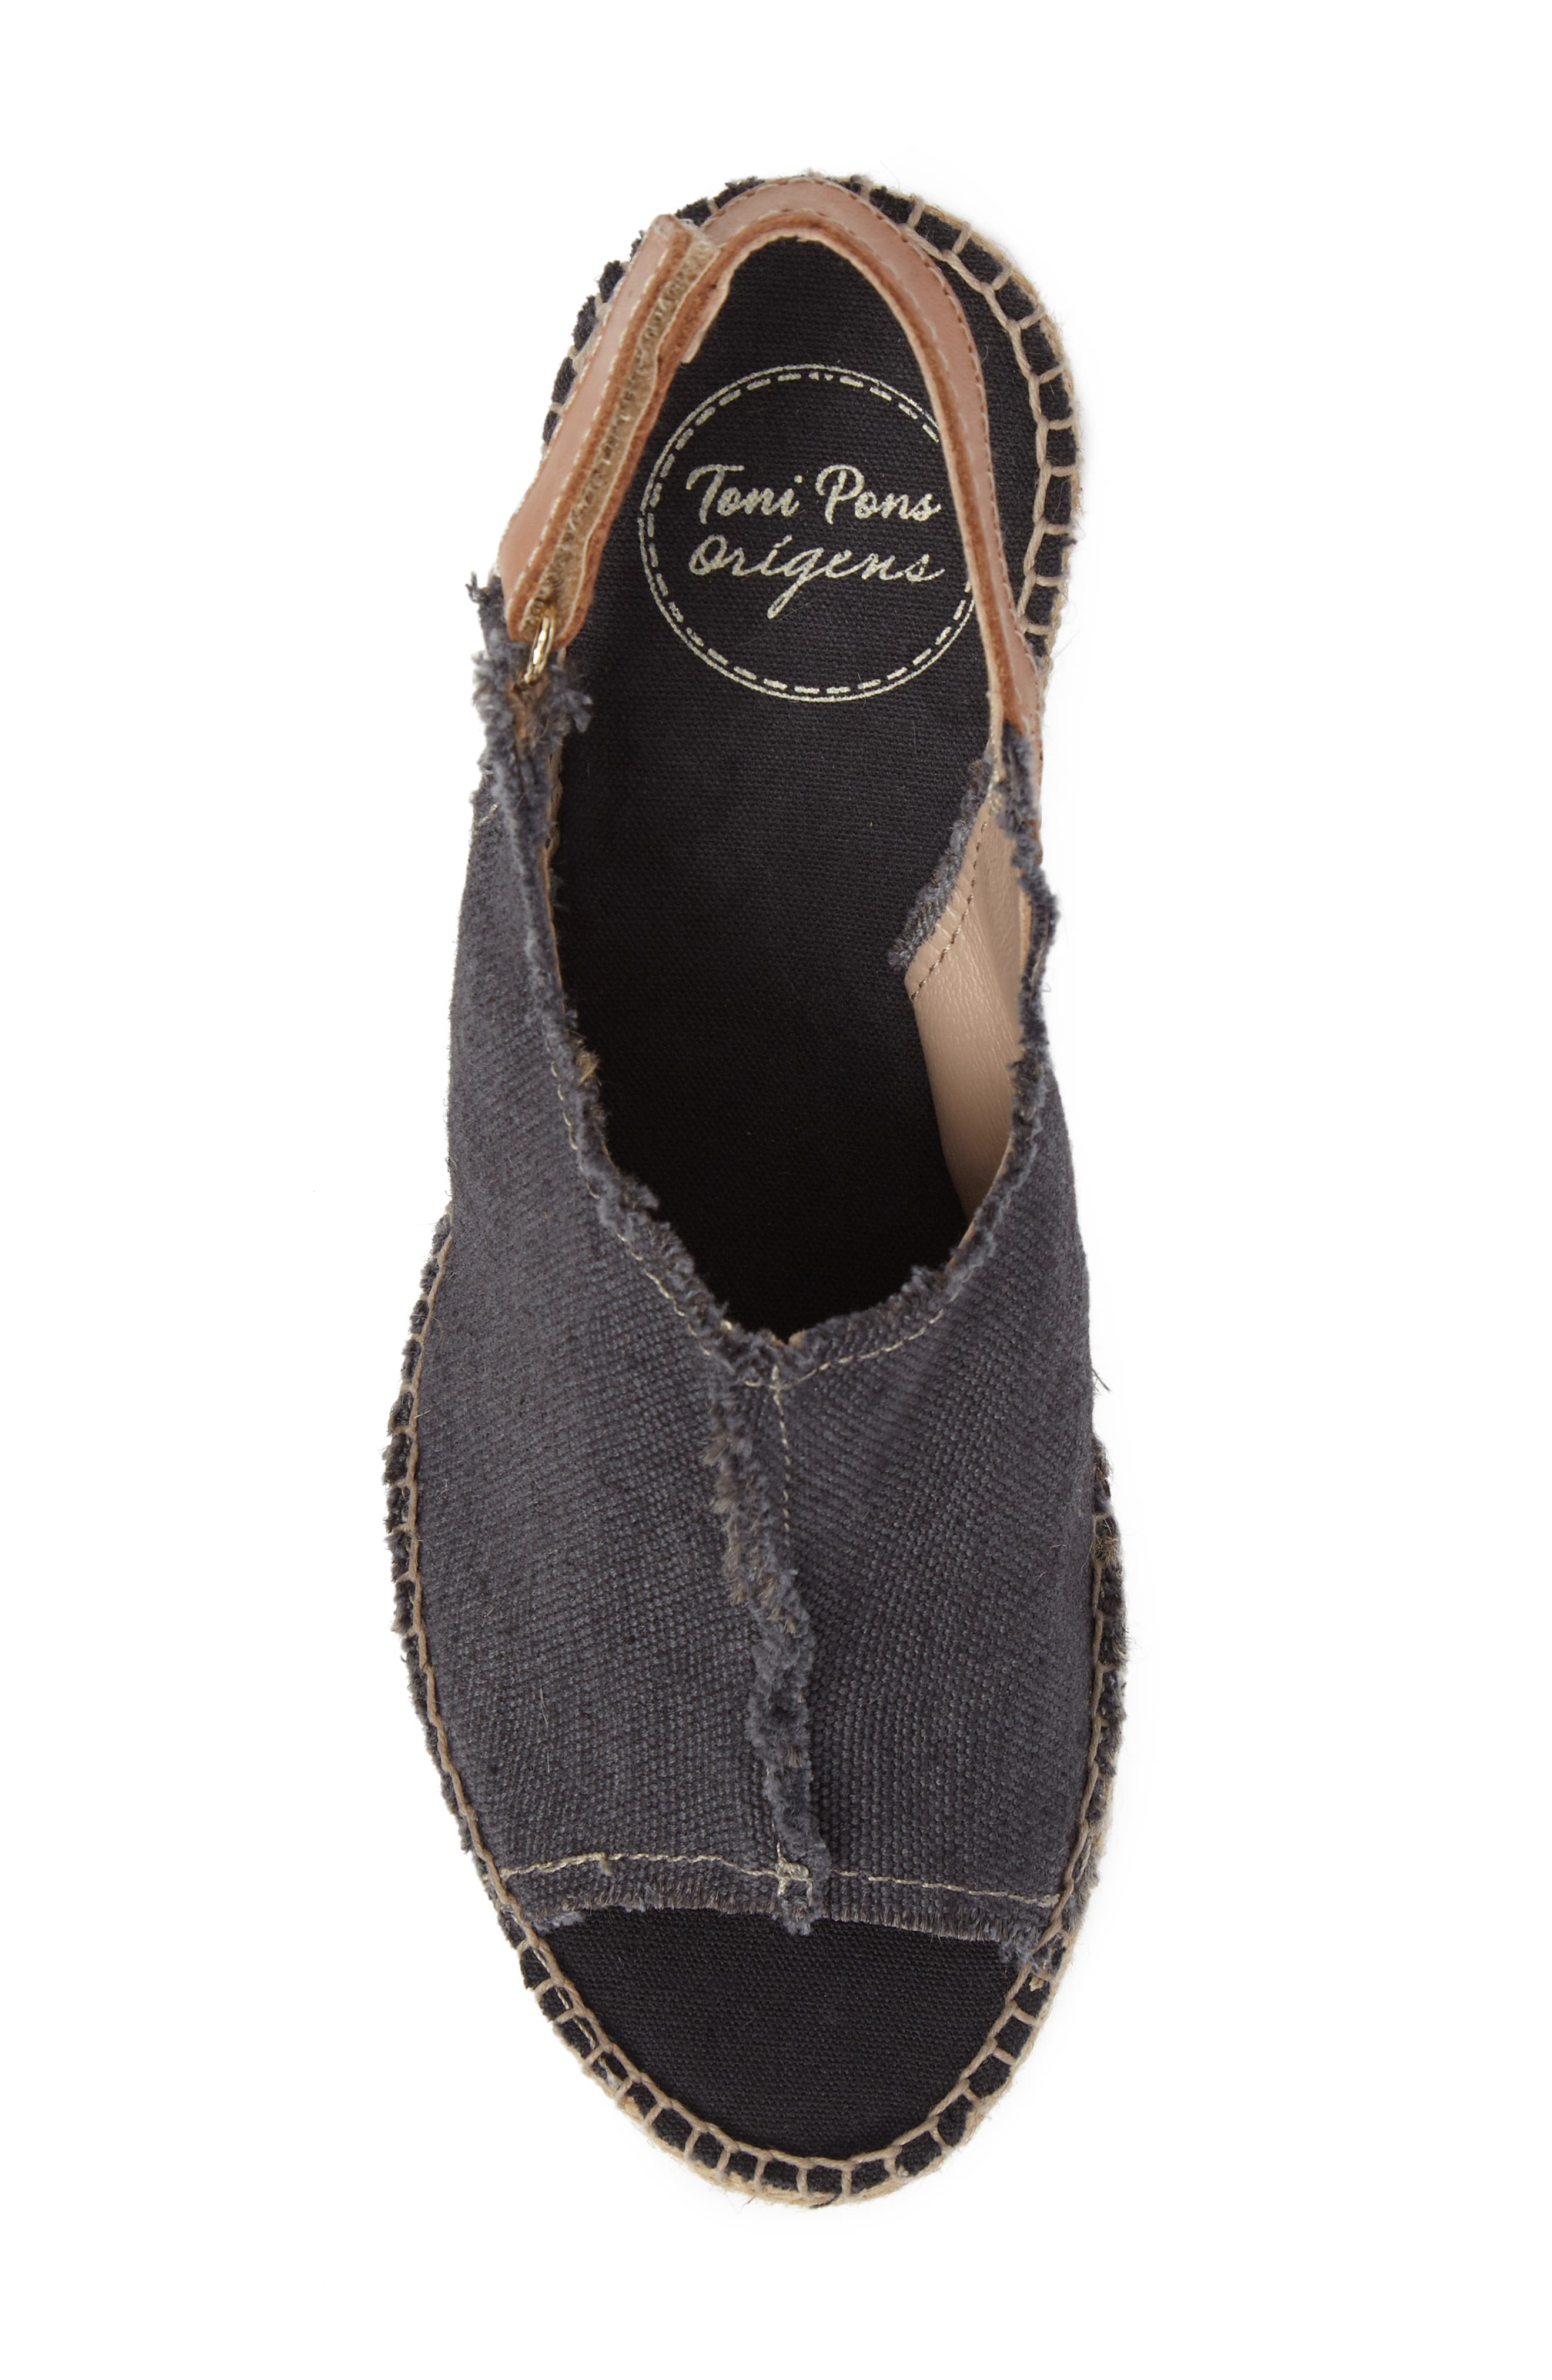 TONI PONS, 'Lugano' Espadrille Wedge Sandal, Alternate thumbnail 5, color, BLACK FABRIC